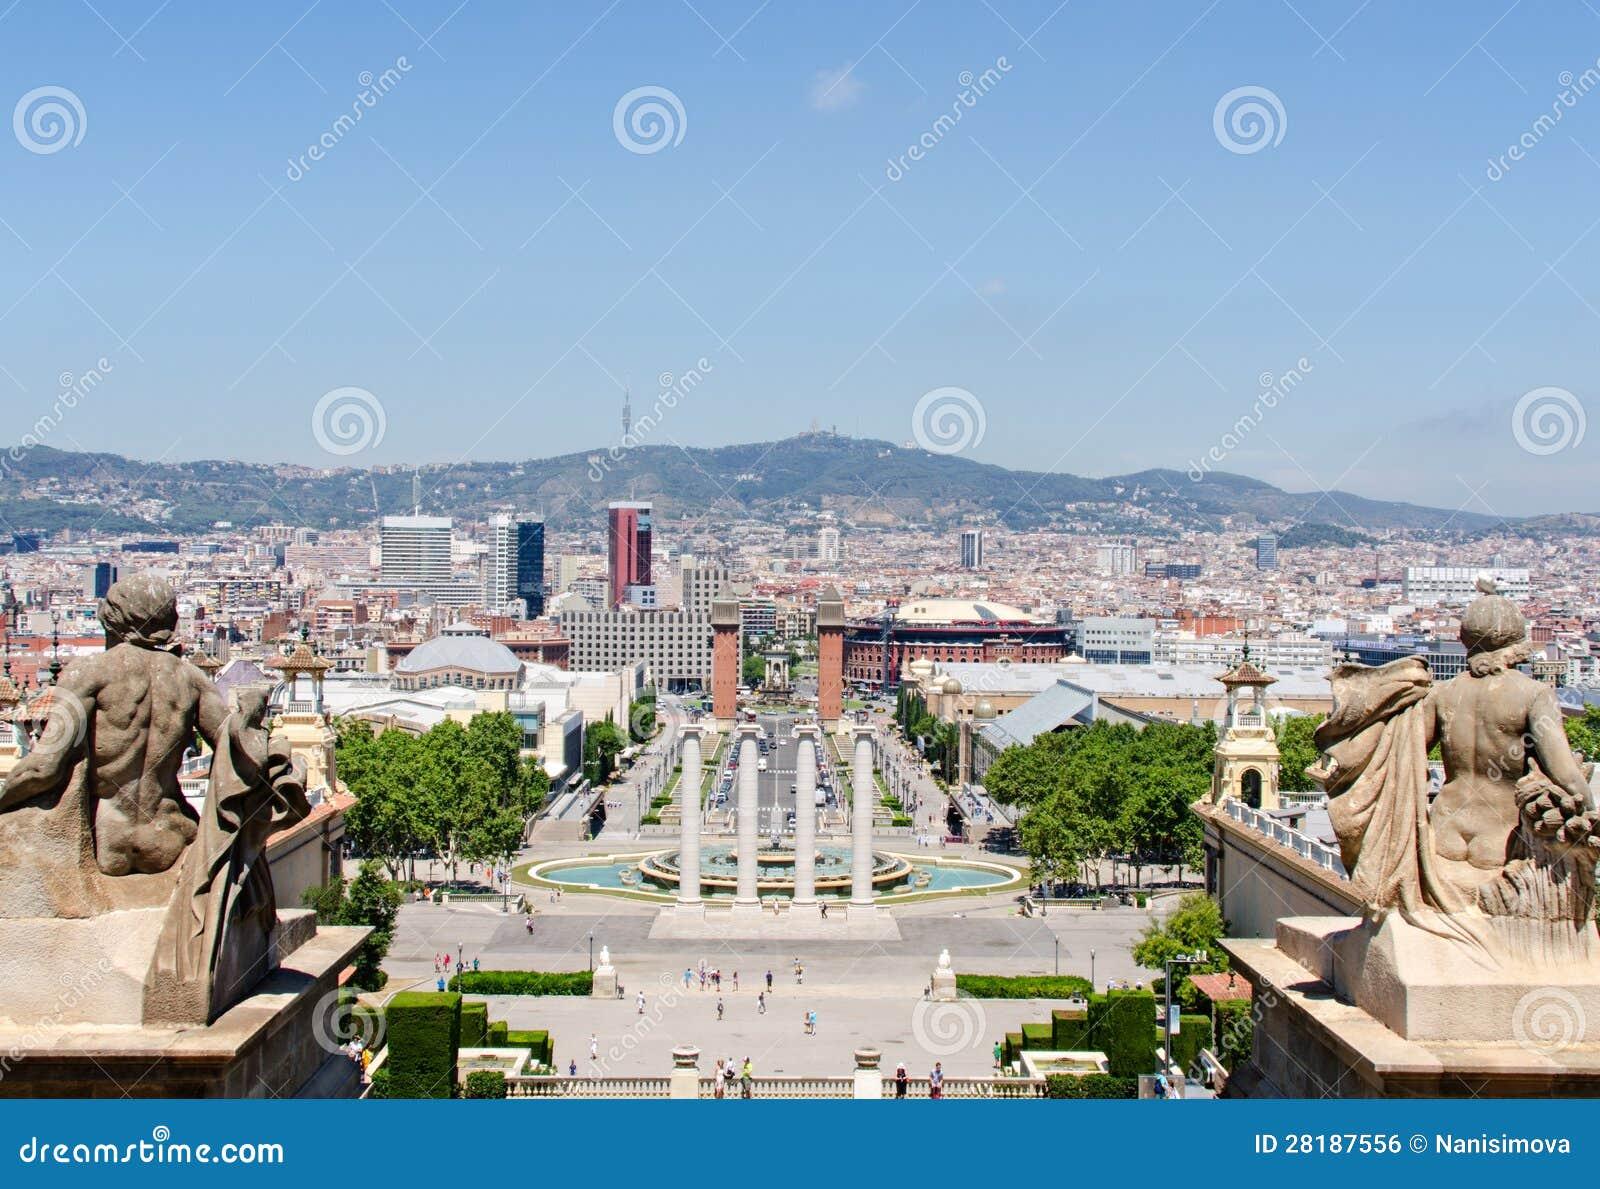 Download Montjuic Fountain On Plaza De Espana In Barcelona Spain Stock Photo - Image of city, espanya: 28187556